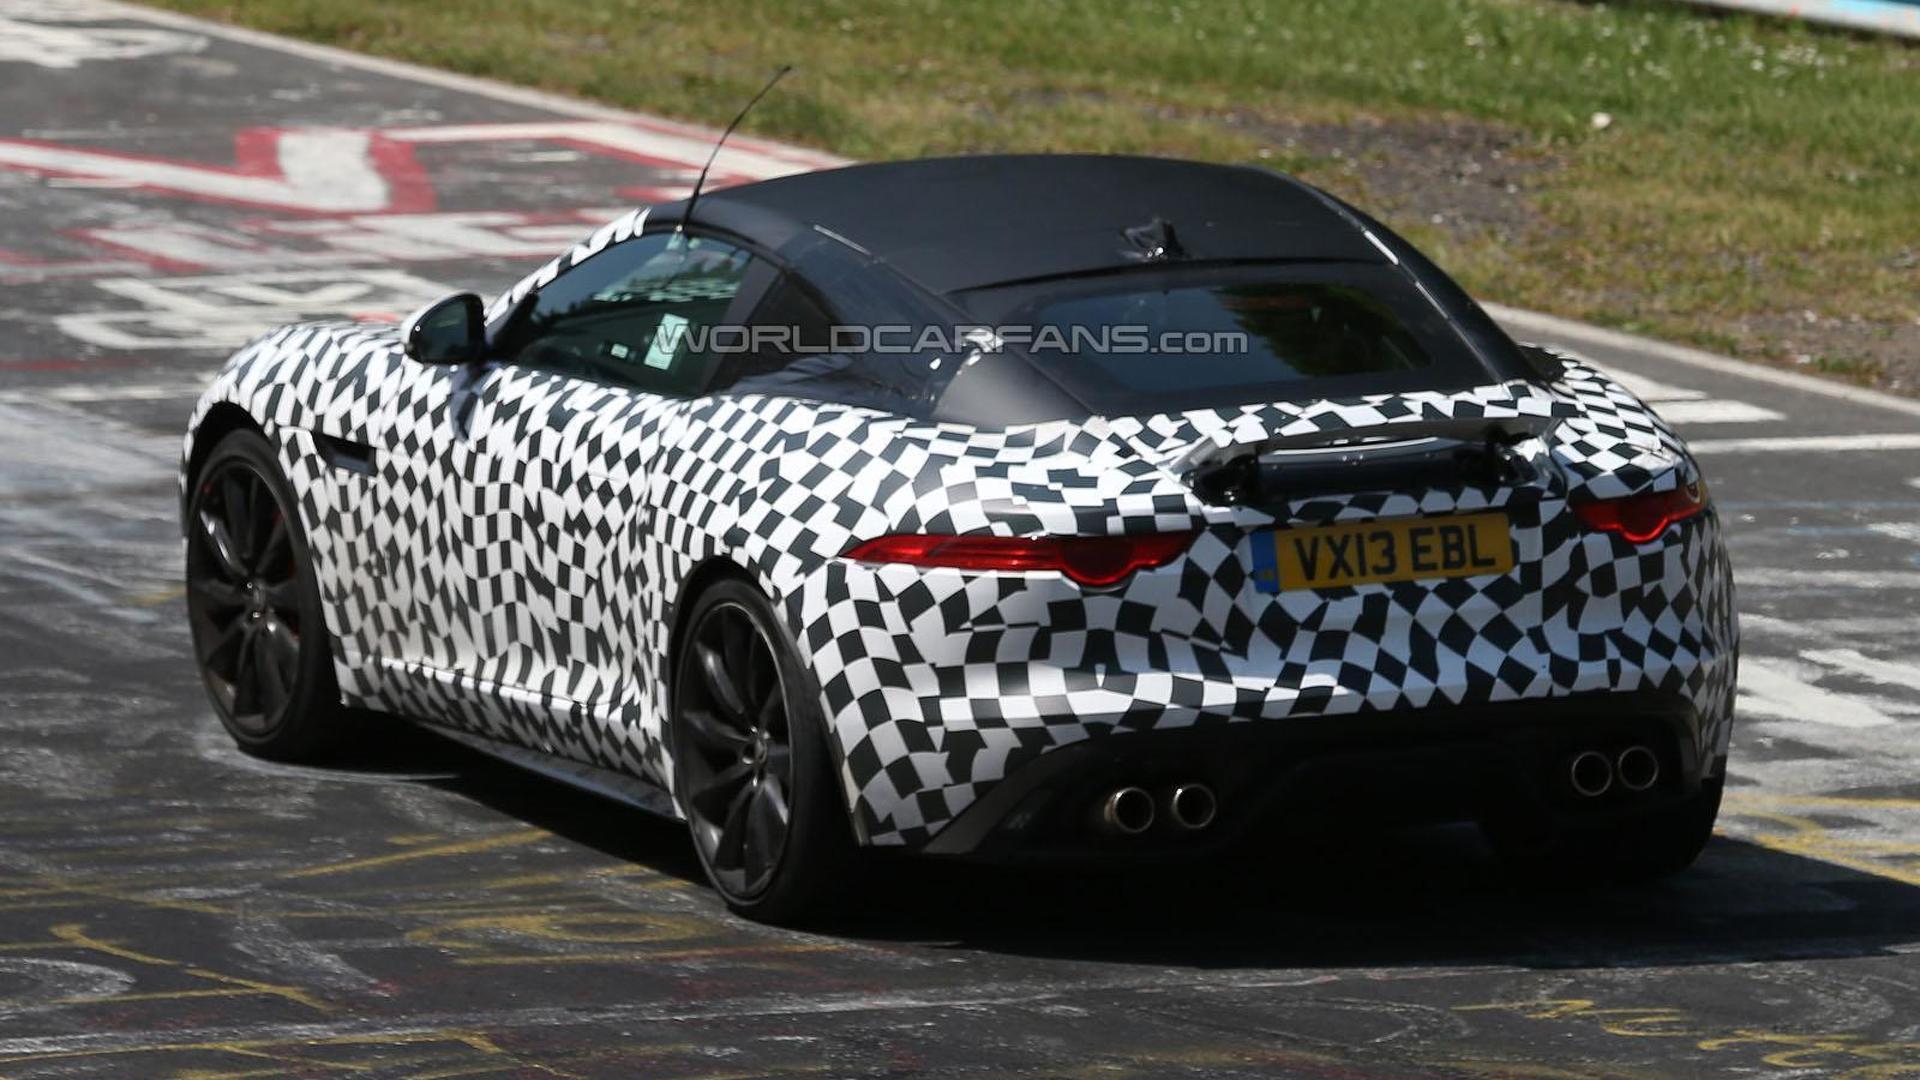 2014 Jaguar F-Type Coupe spied [video]